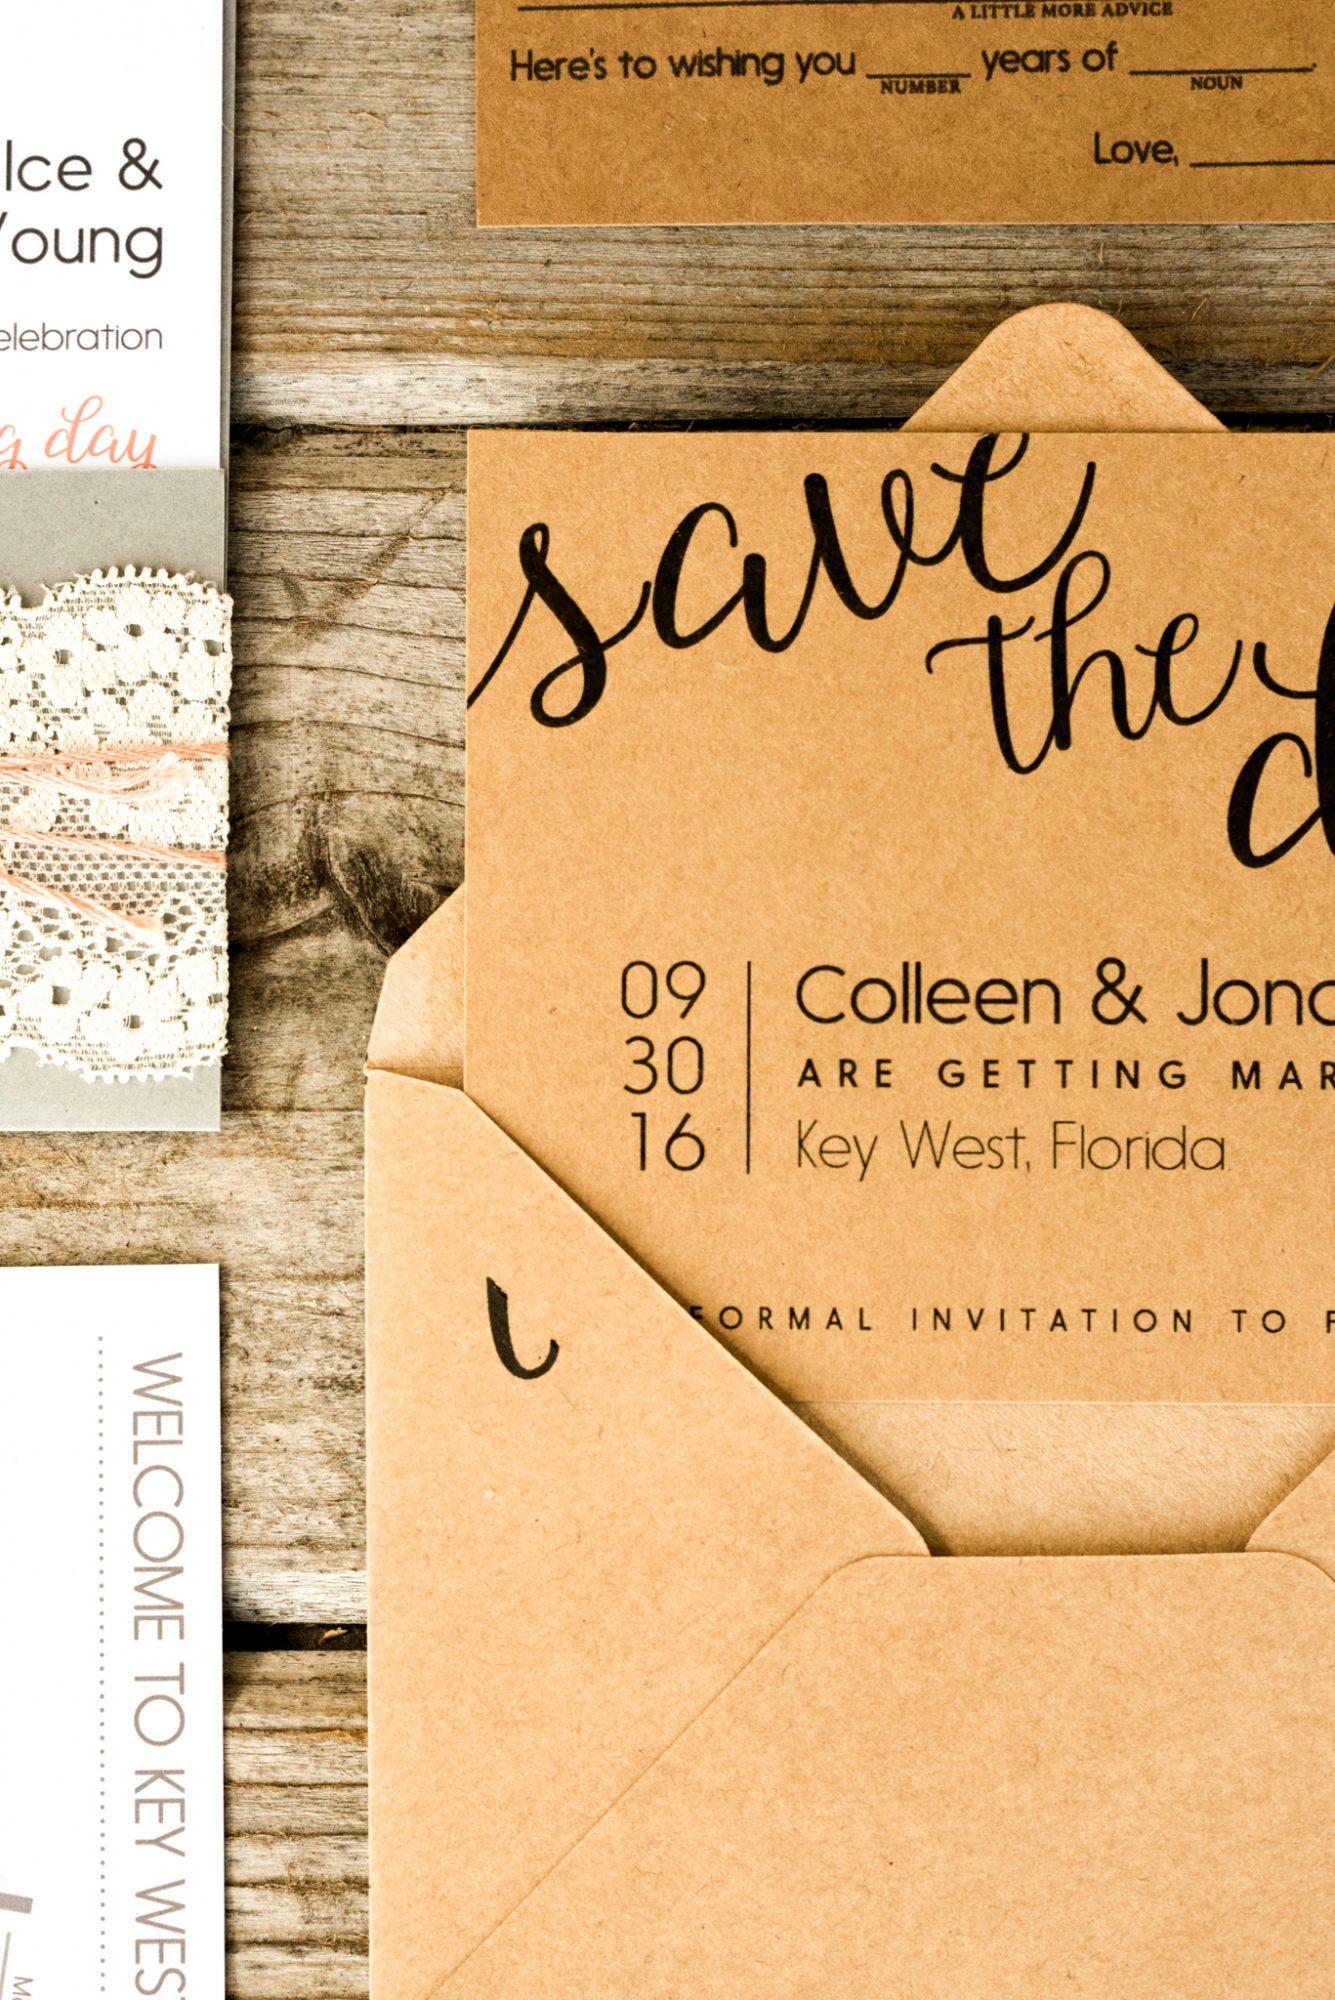 colleen-jonathan-audubon-house-wedding-key-west-1